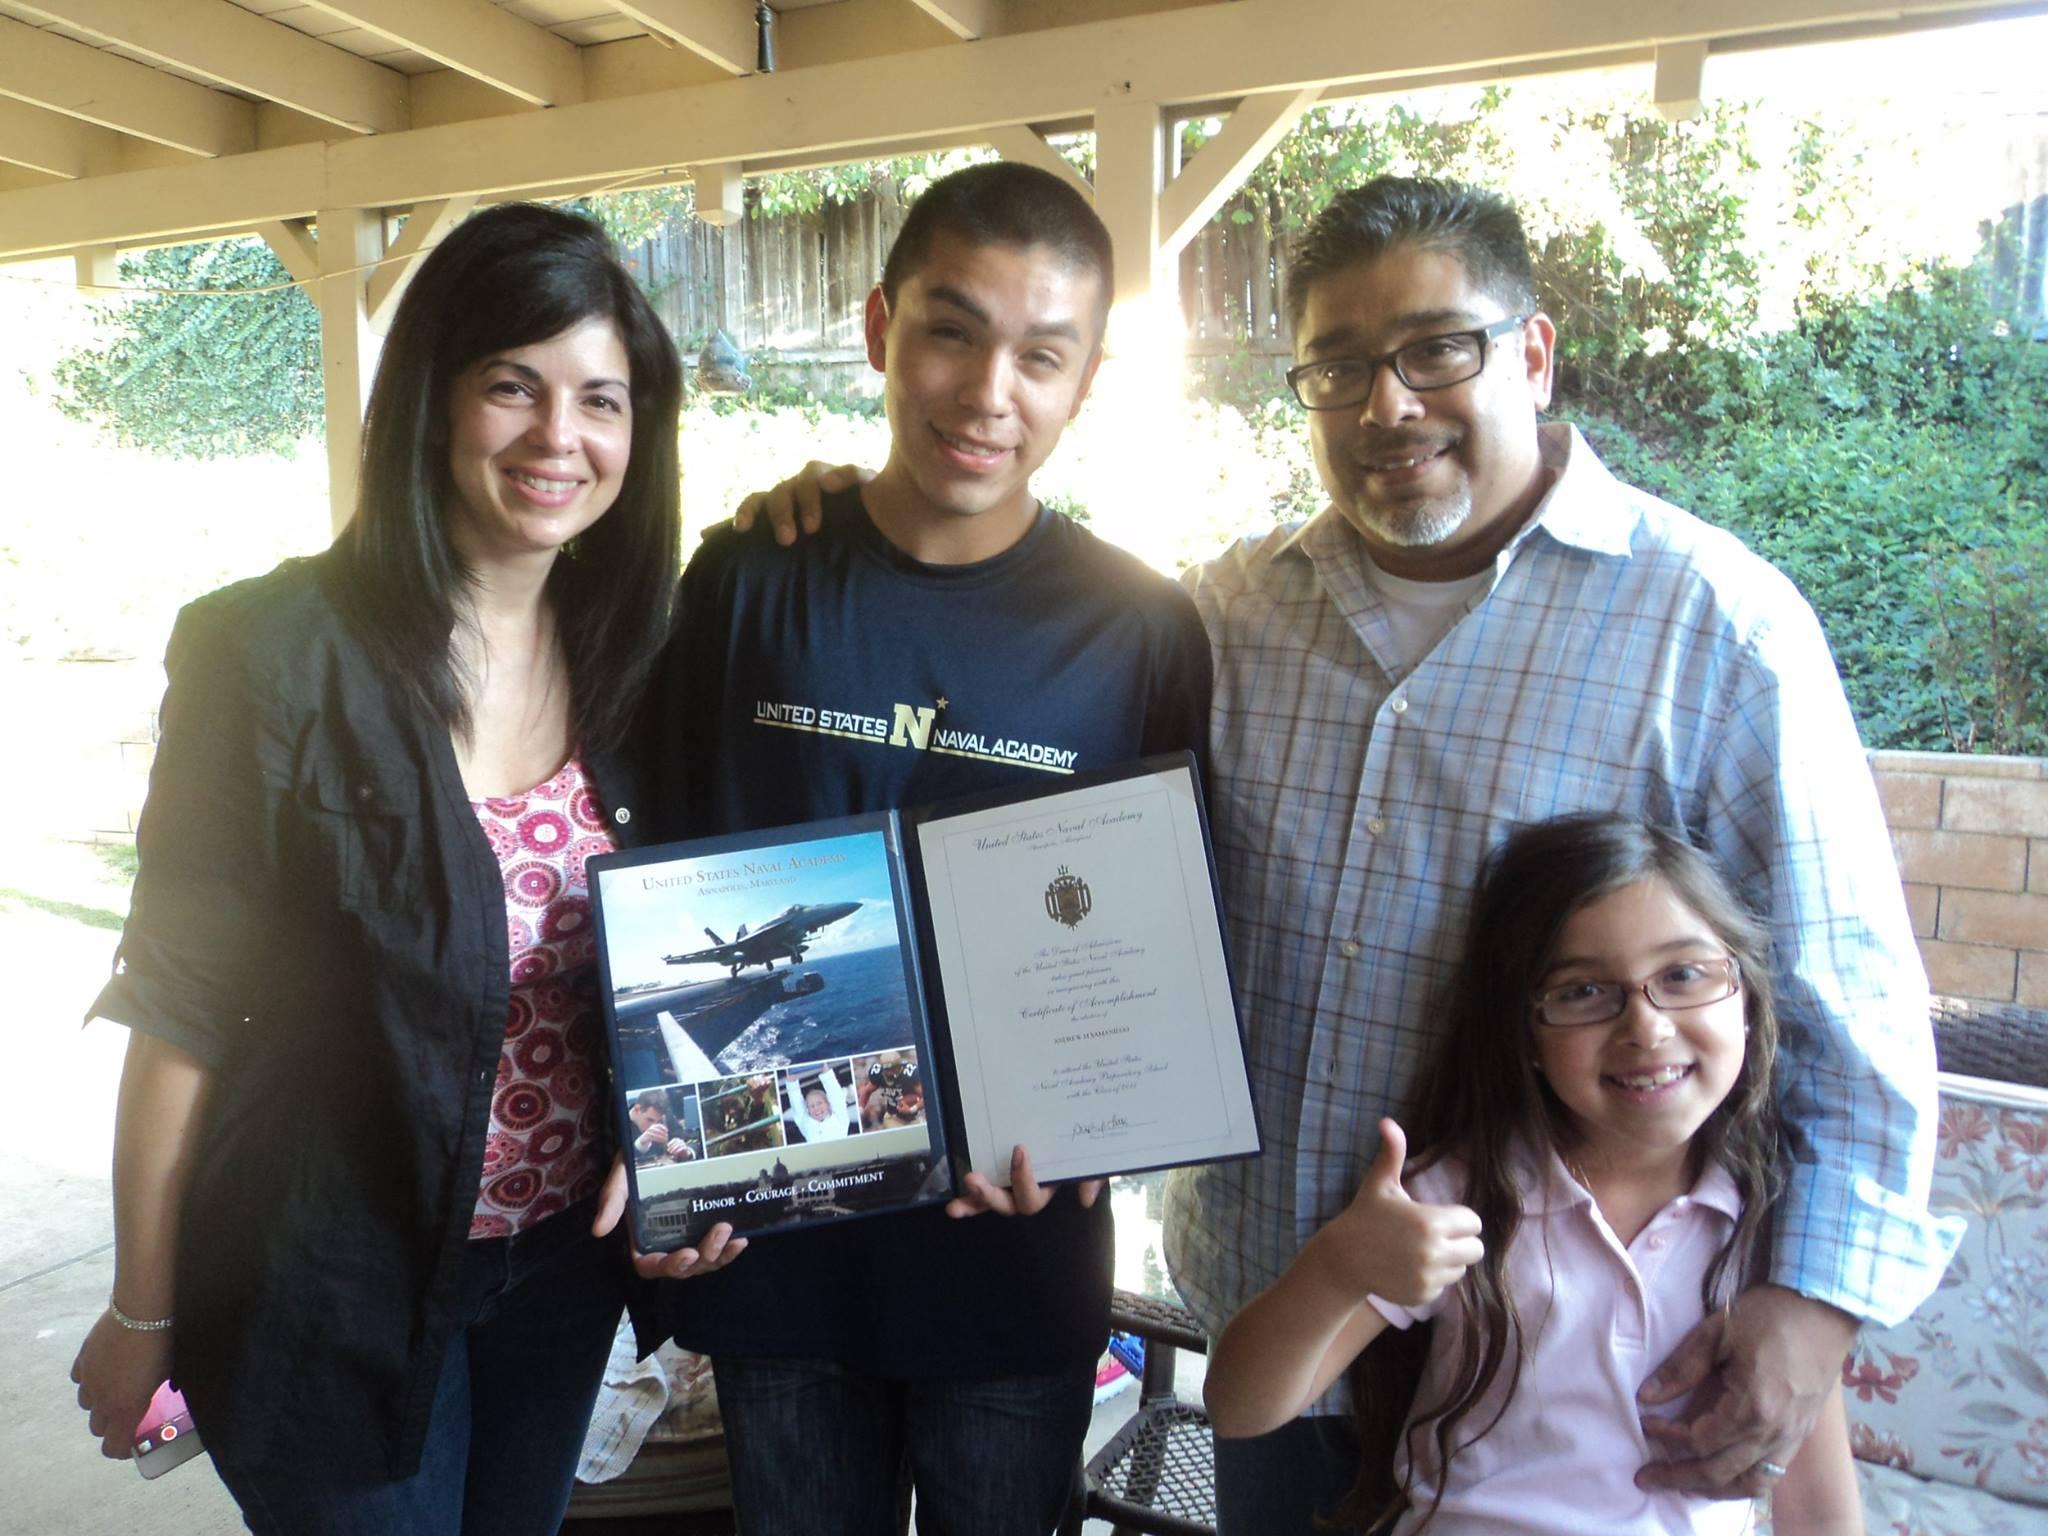 Samaniego Family Proud of Andrew